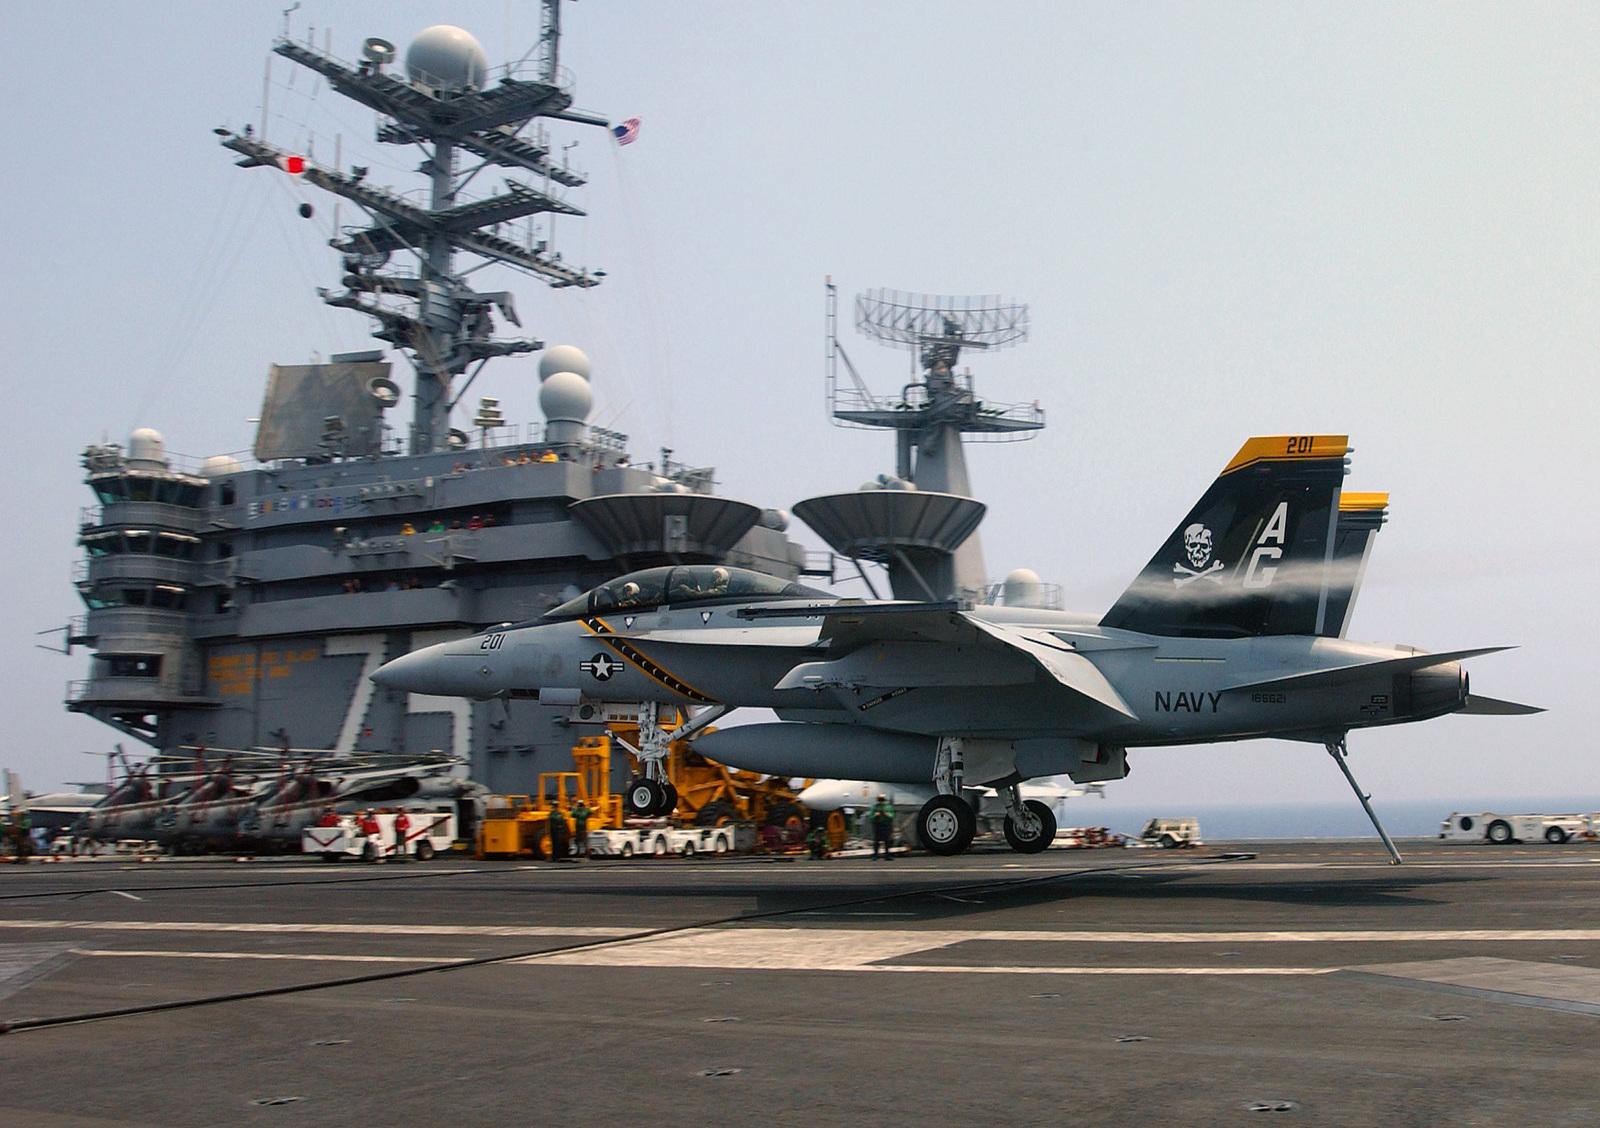 a-us-navy-usn-fa-18f-super-hornet-strike-fighter-squadron-103-vfa-103-jolly-c4286a-1600.jpg